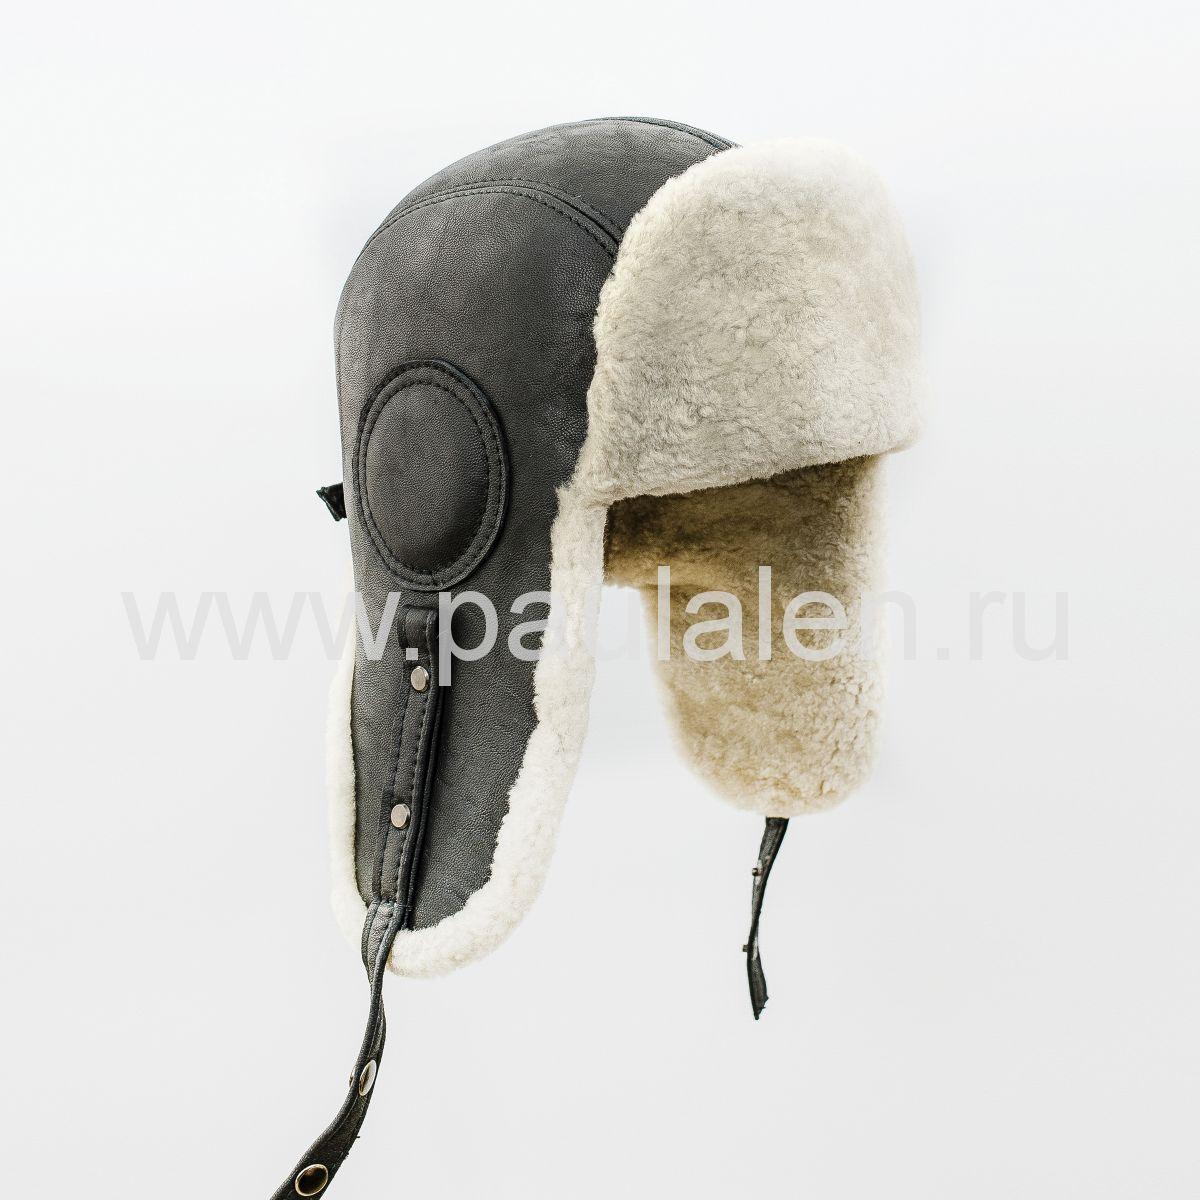 "Мужская шапка ушанка ""Авиатор"" из кожи и меха овчины. Артикул B055"